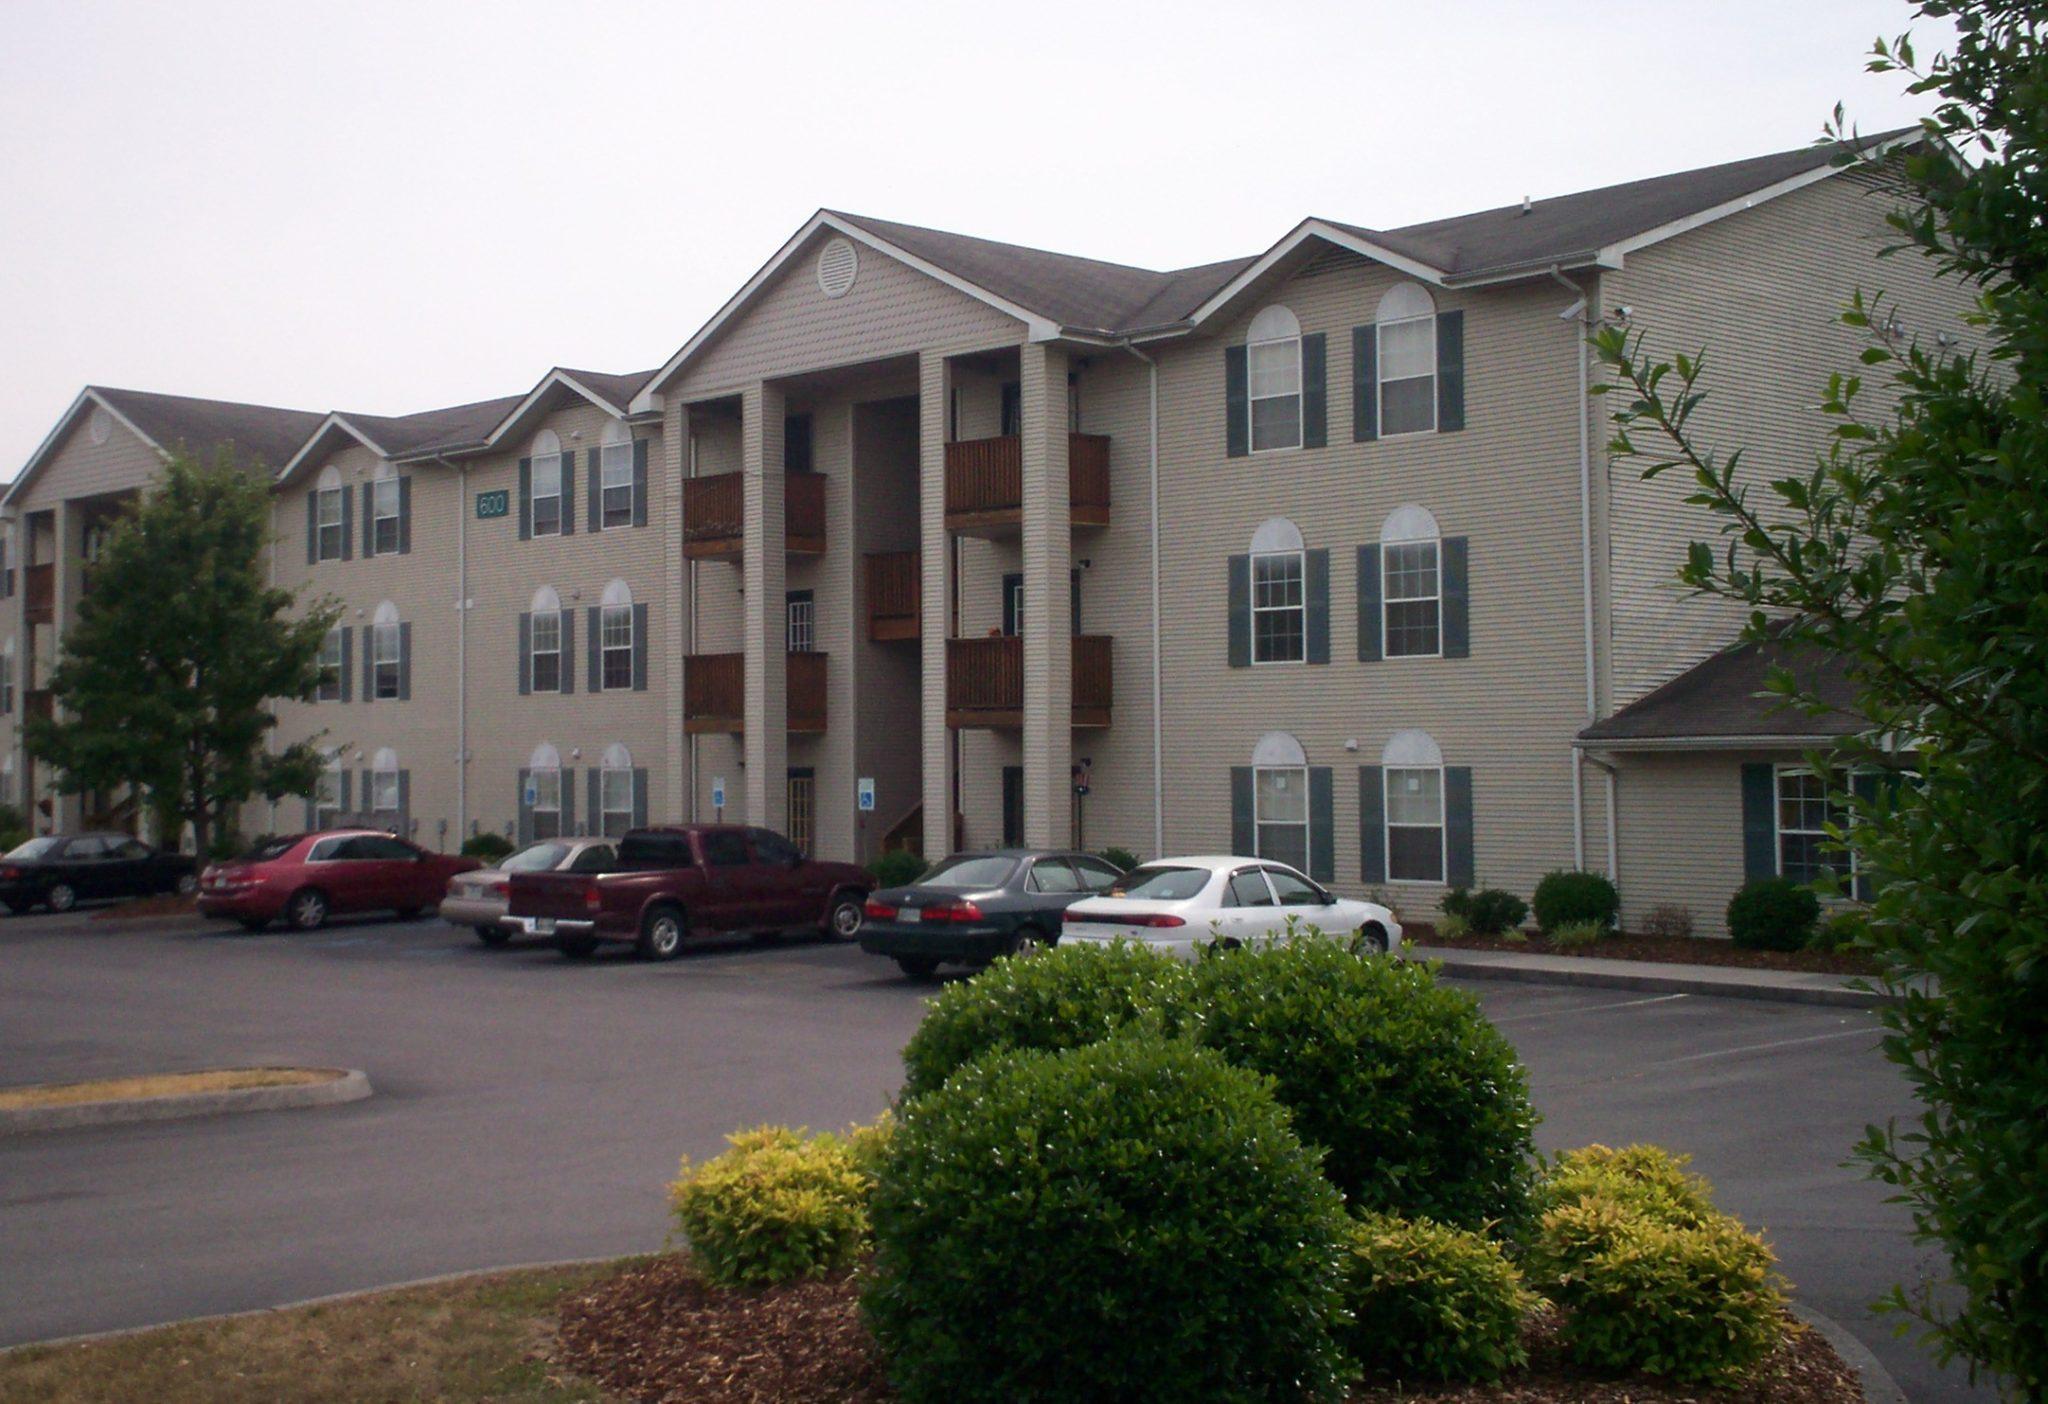 One Wilcox Place Kingsport TN Bldg 600